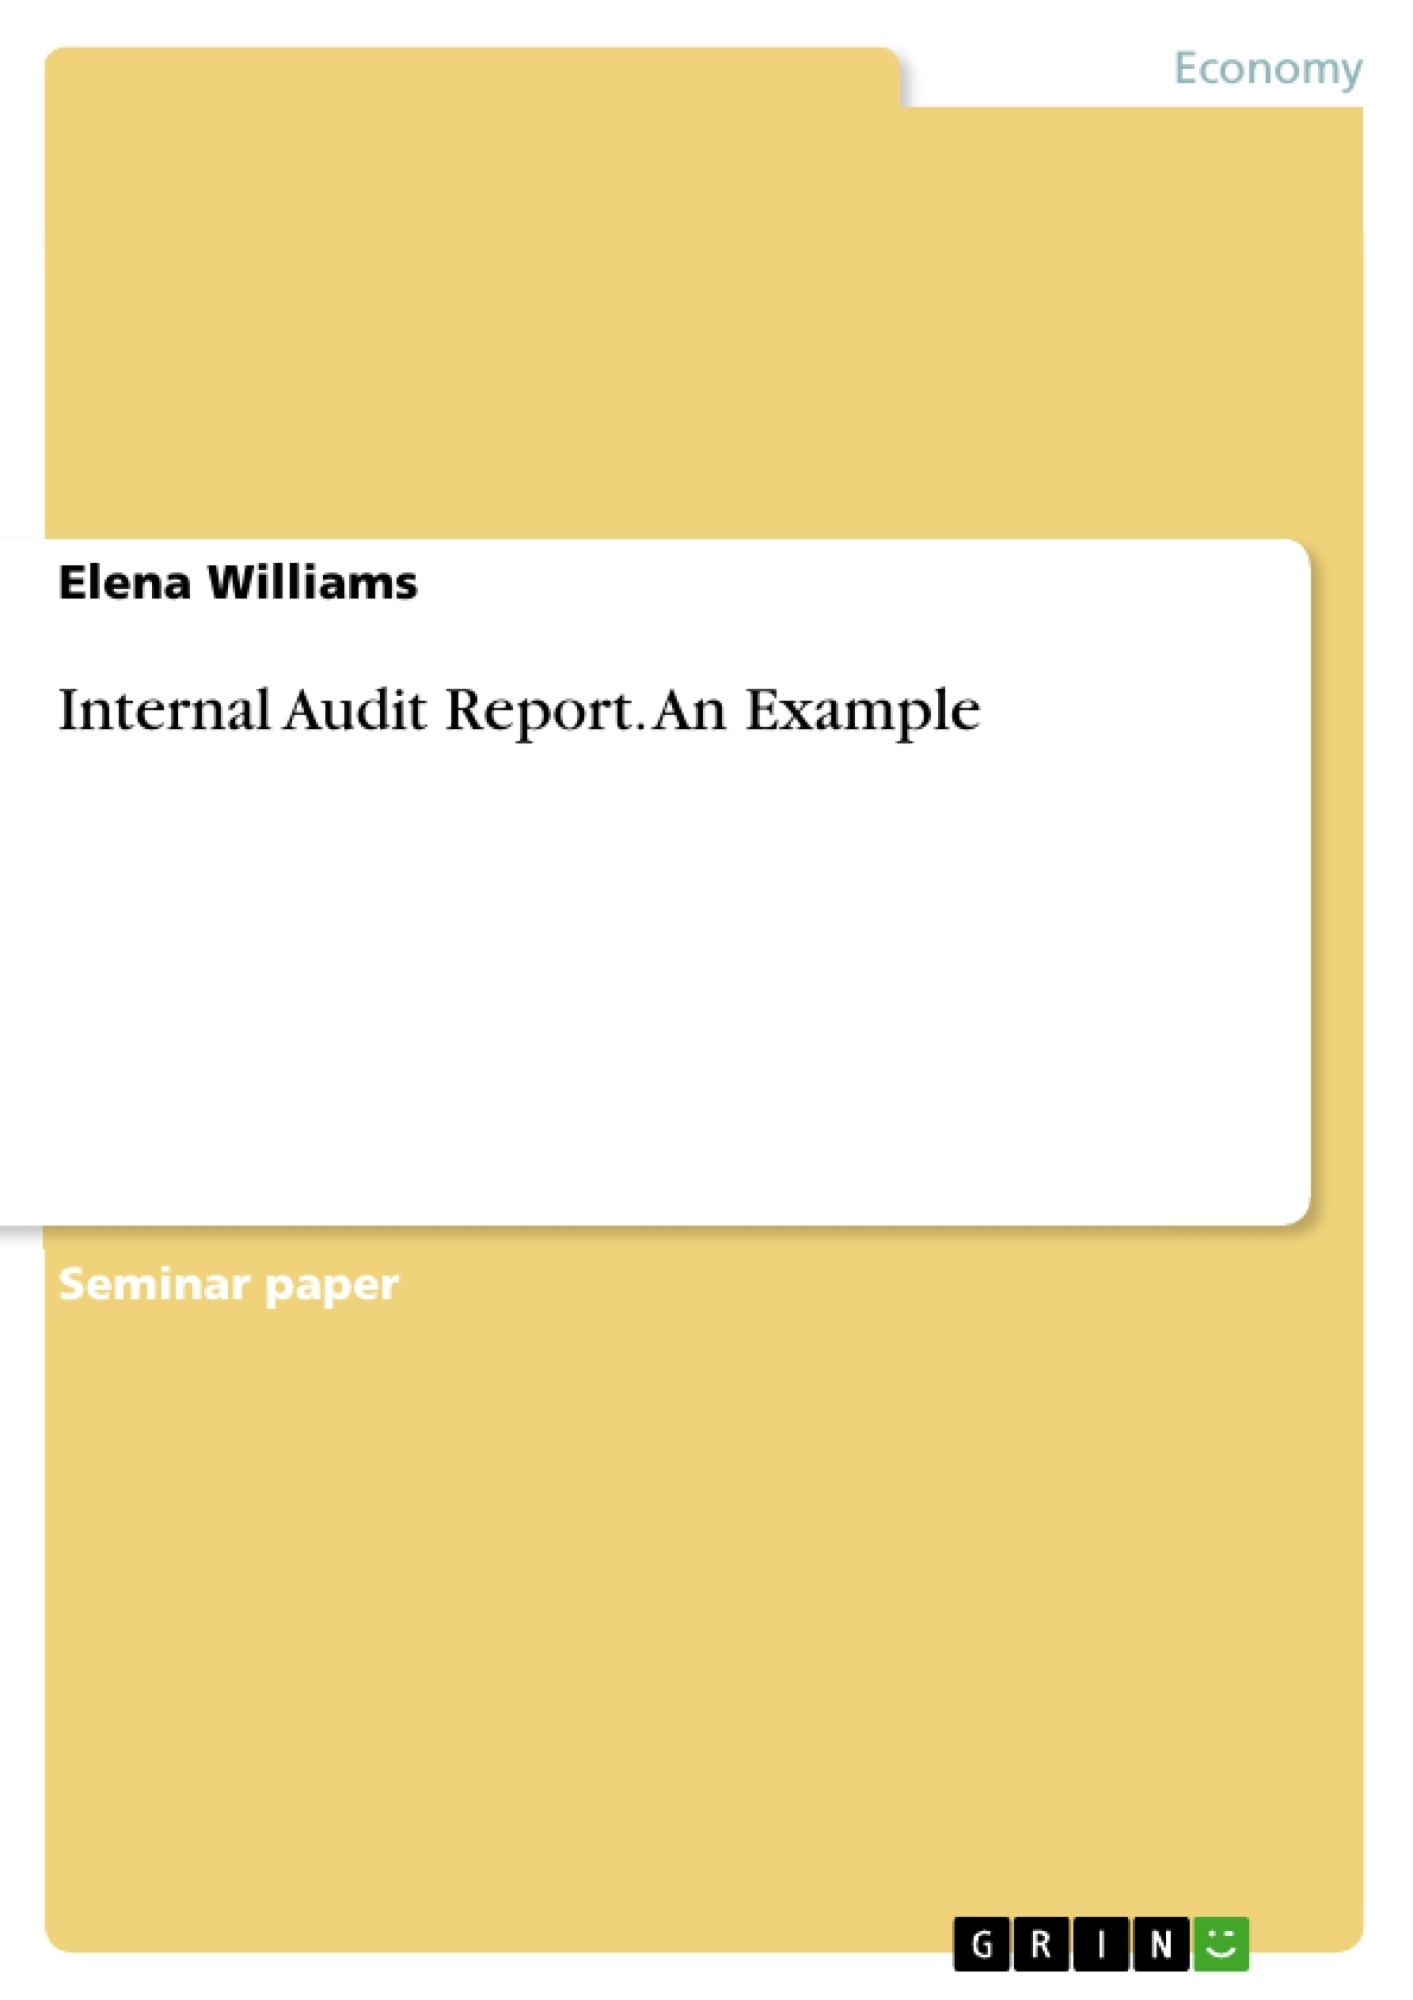 Title: Internal Audit Report. An Example